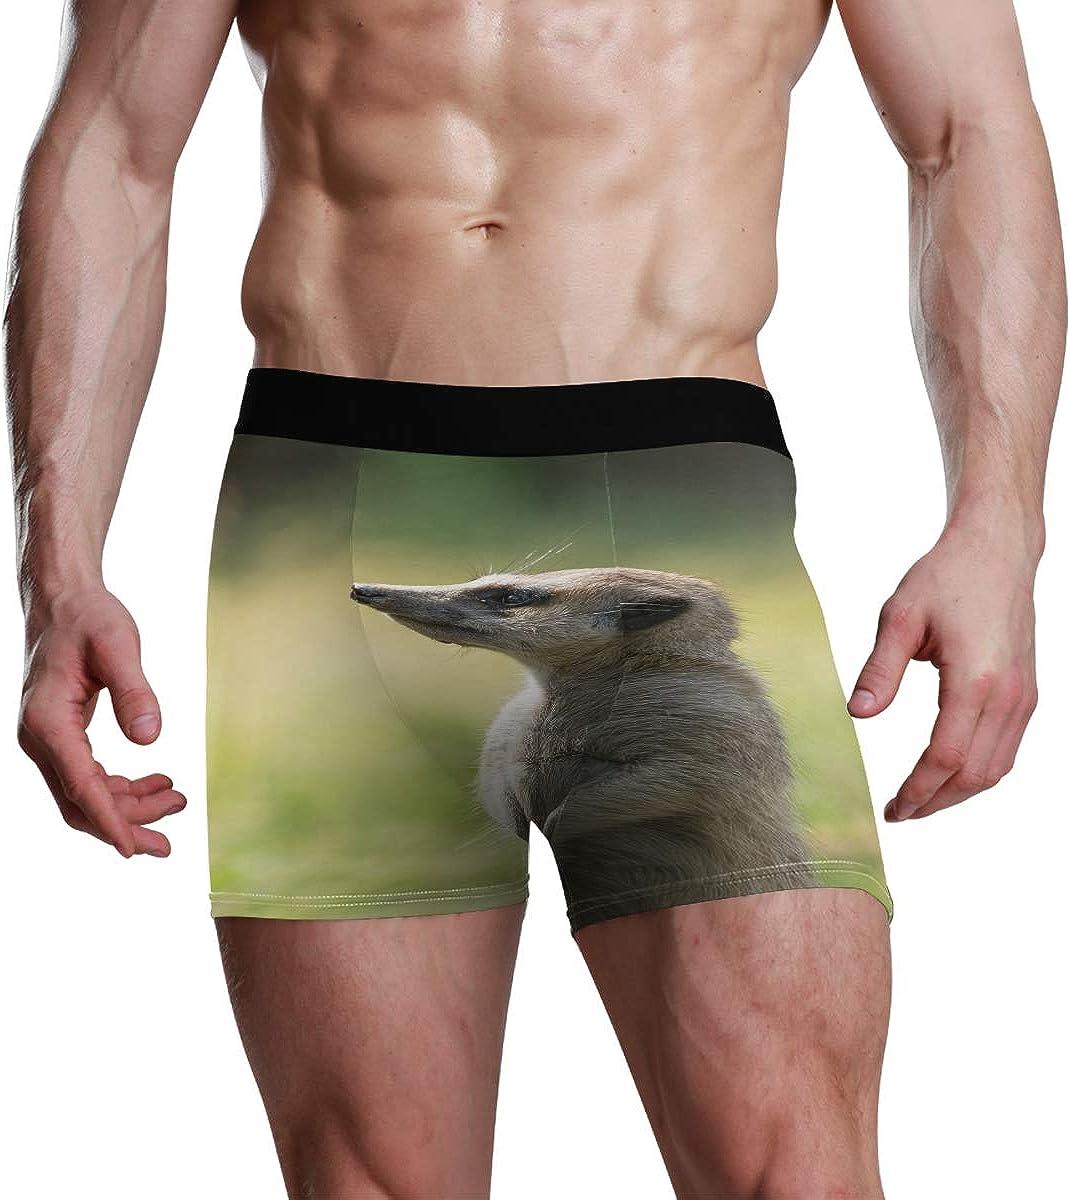 Men's Boxer Briefs Cute Animal Funny Meerkat Bikini Underwear Stretch Trunks Boys Underpants